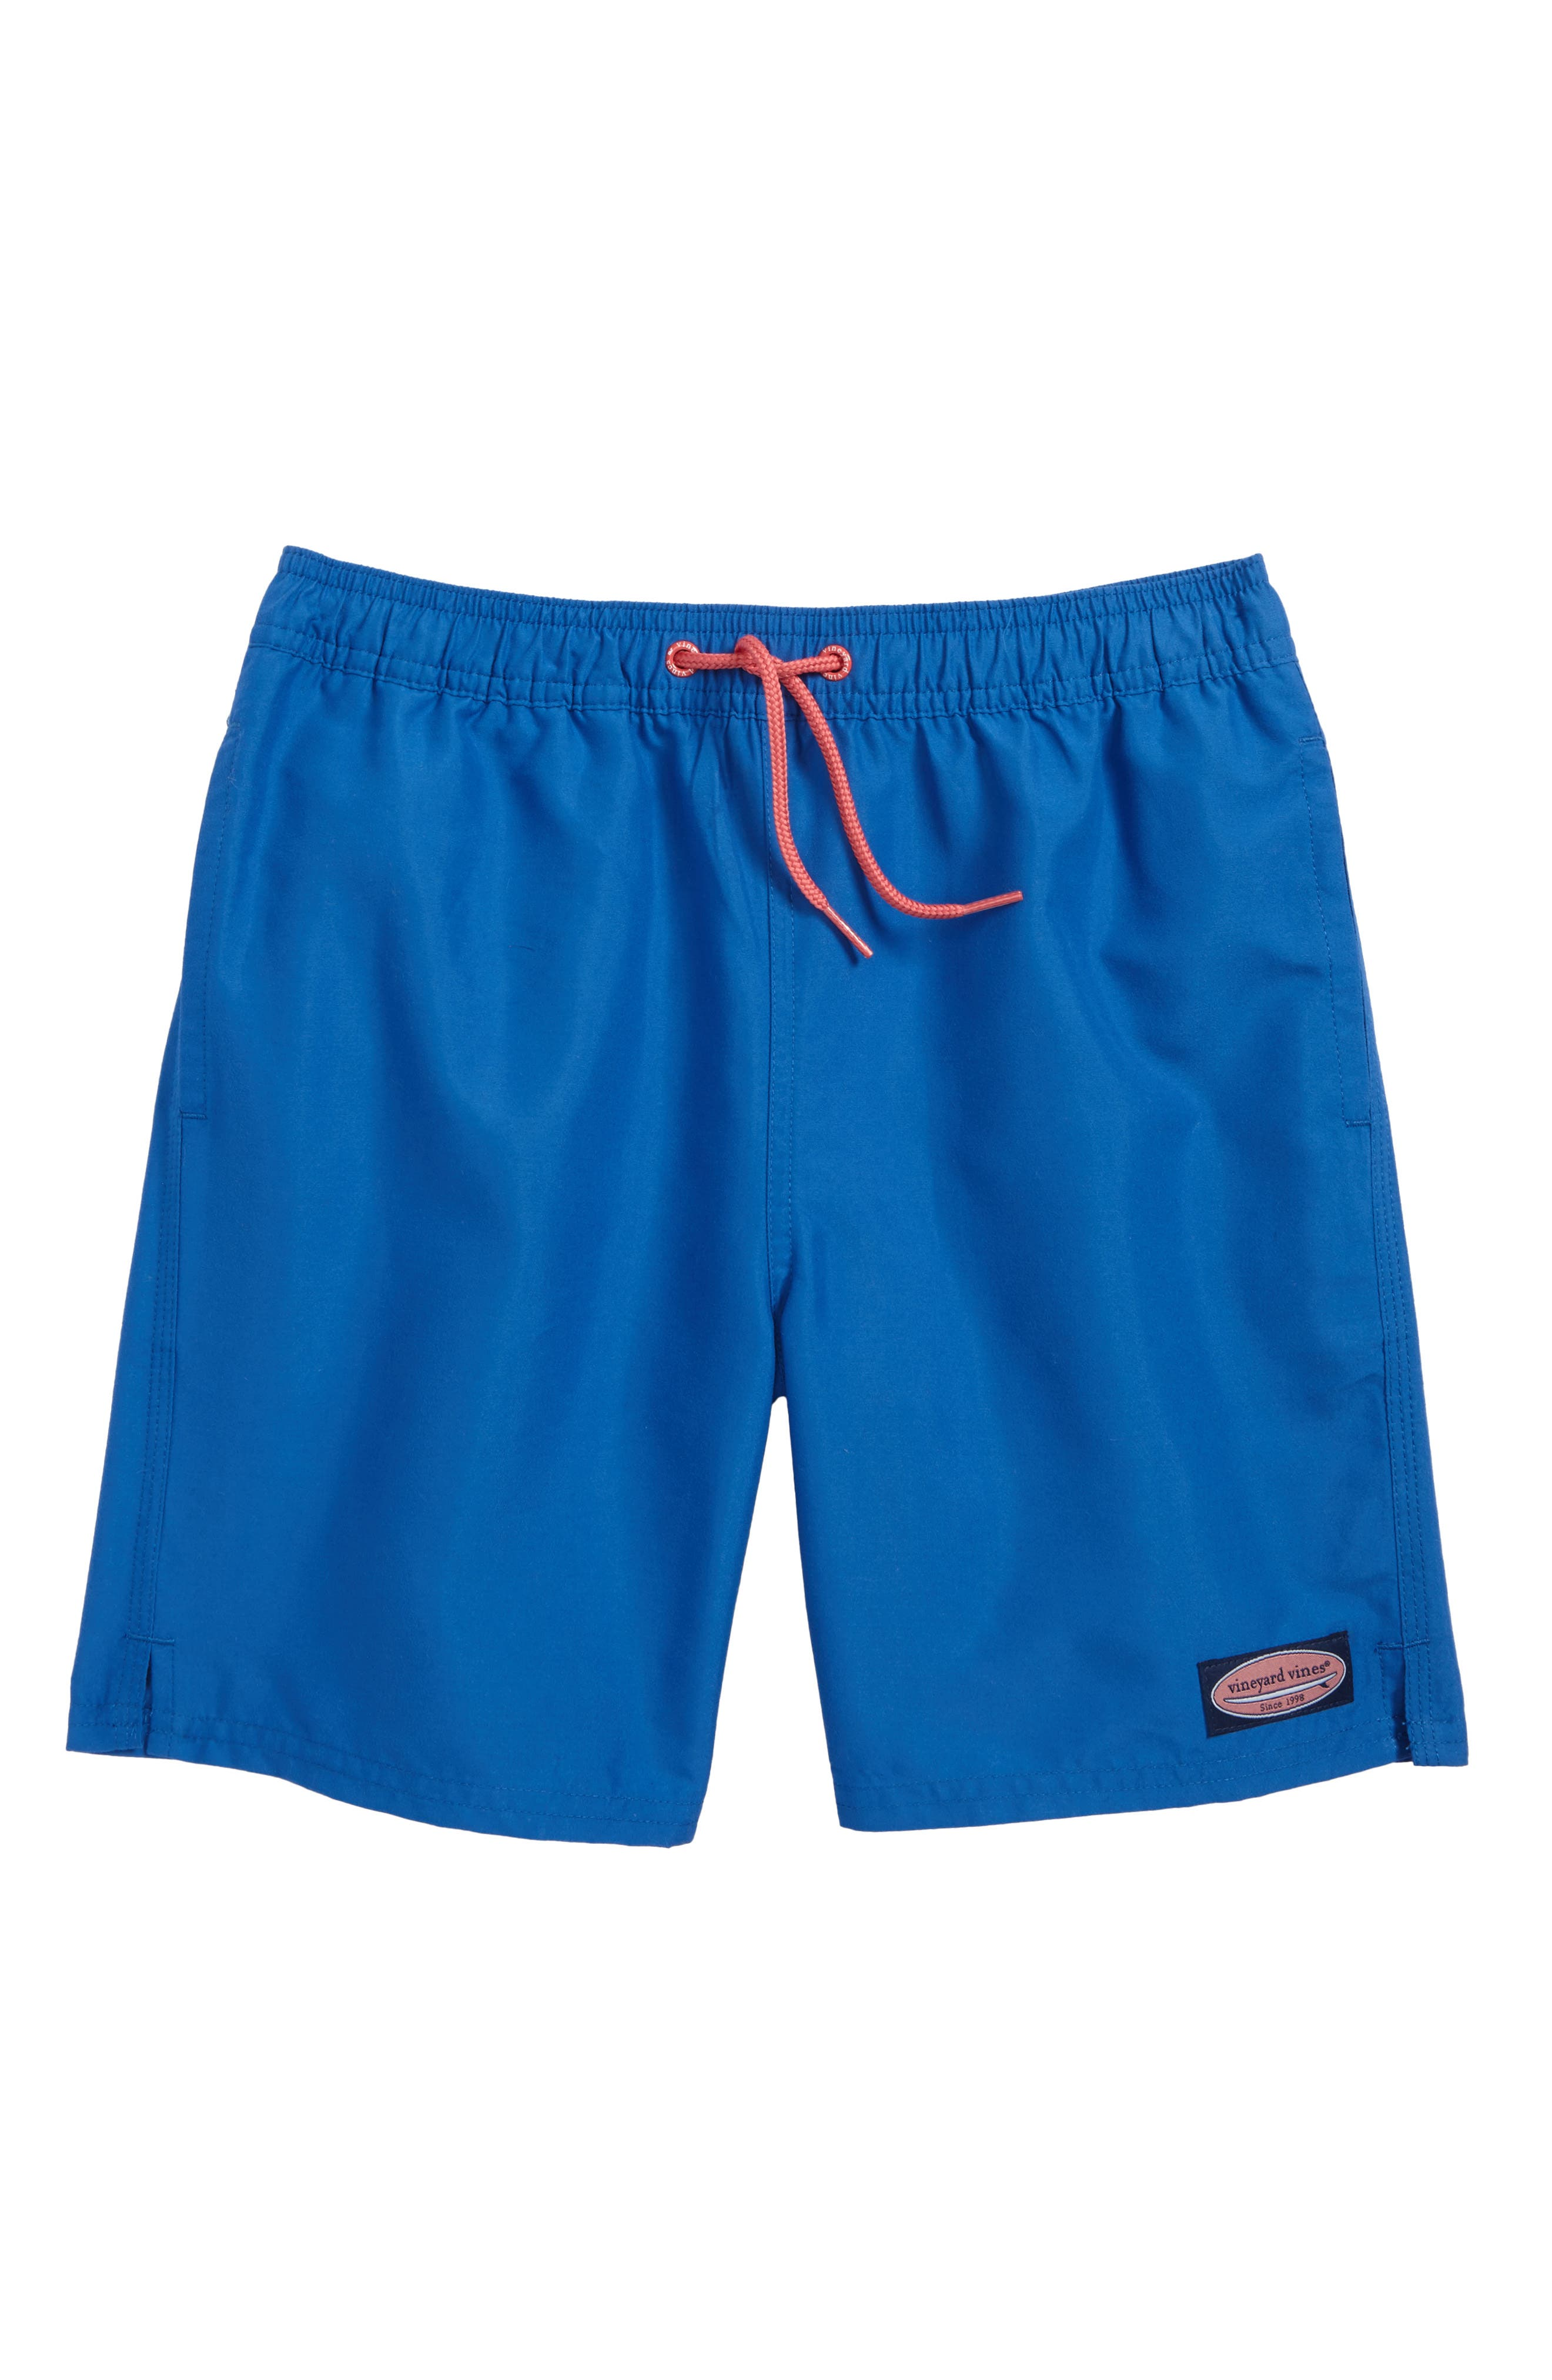 Main Image - Vineyard Vines Bungalow Board Shorts (Big Boys)